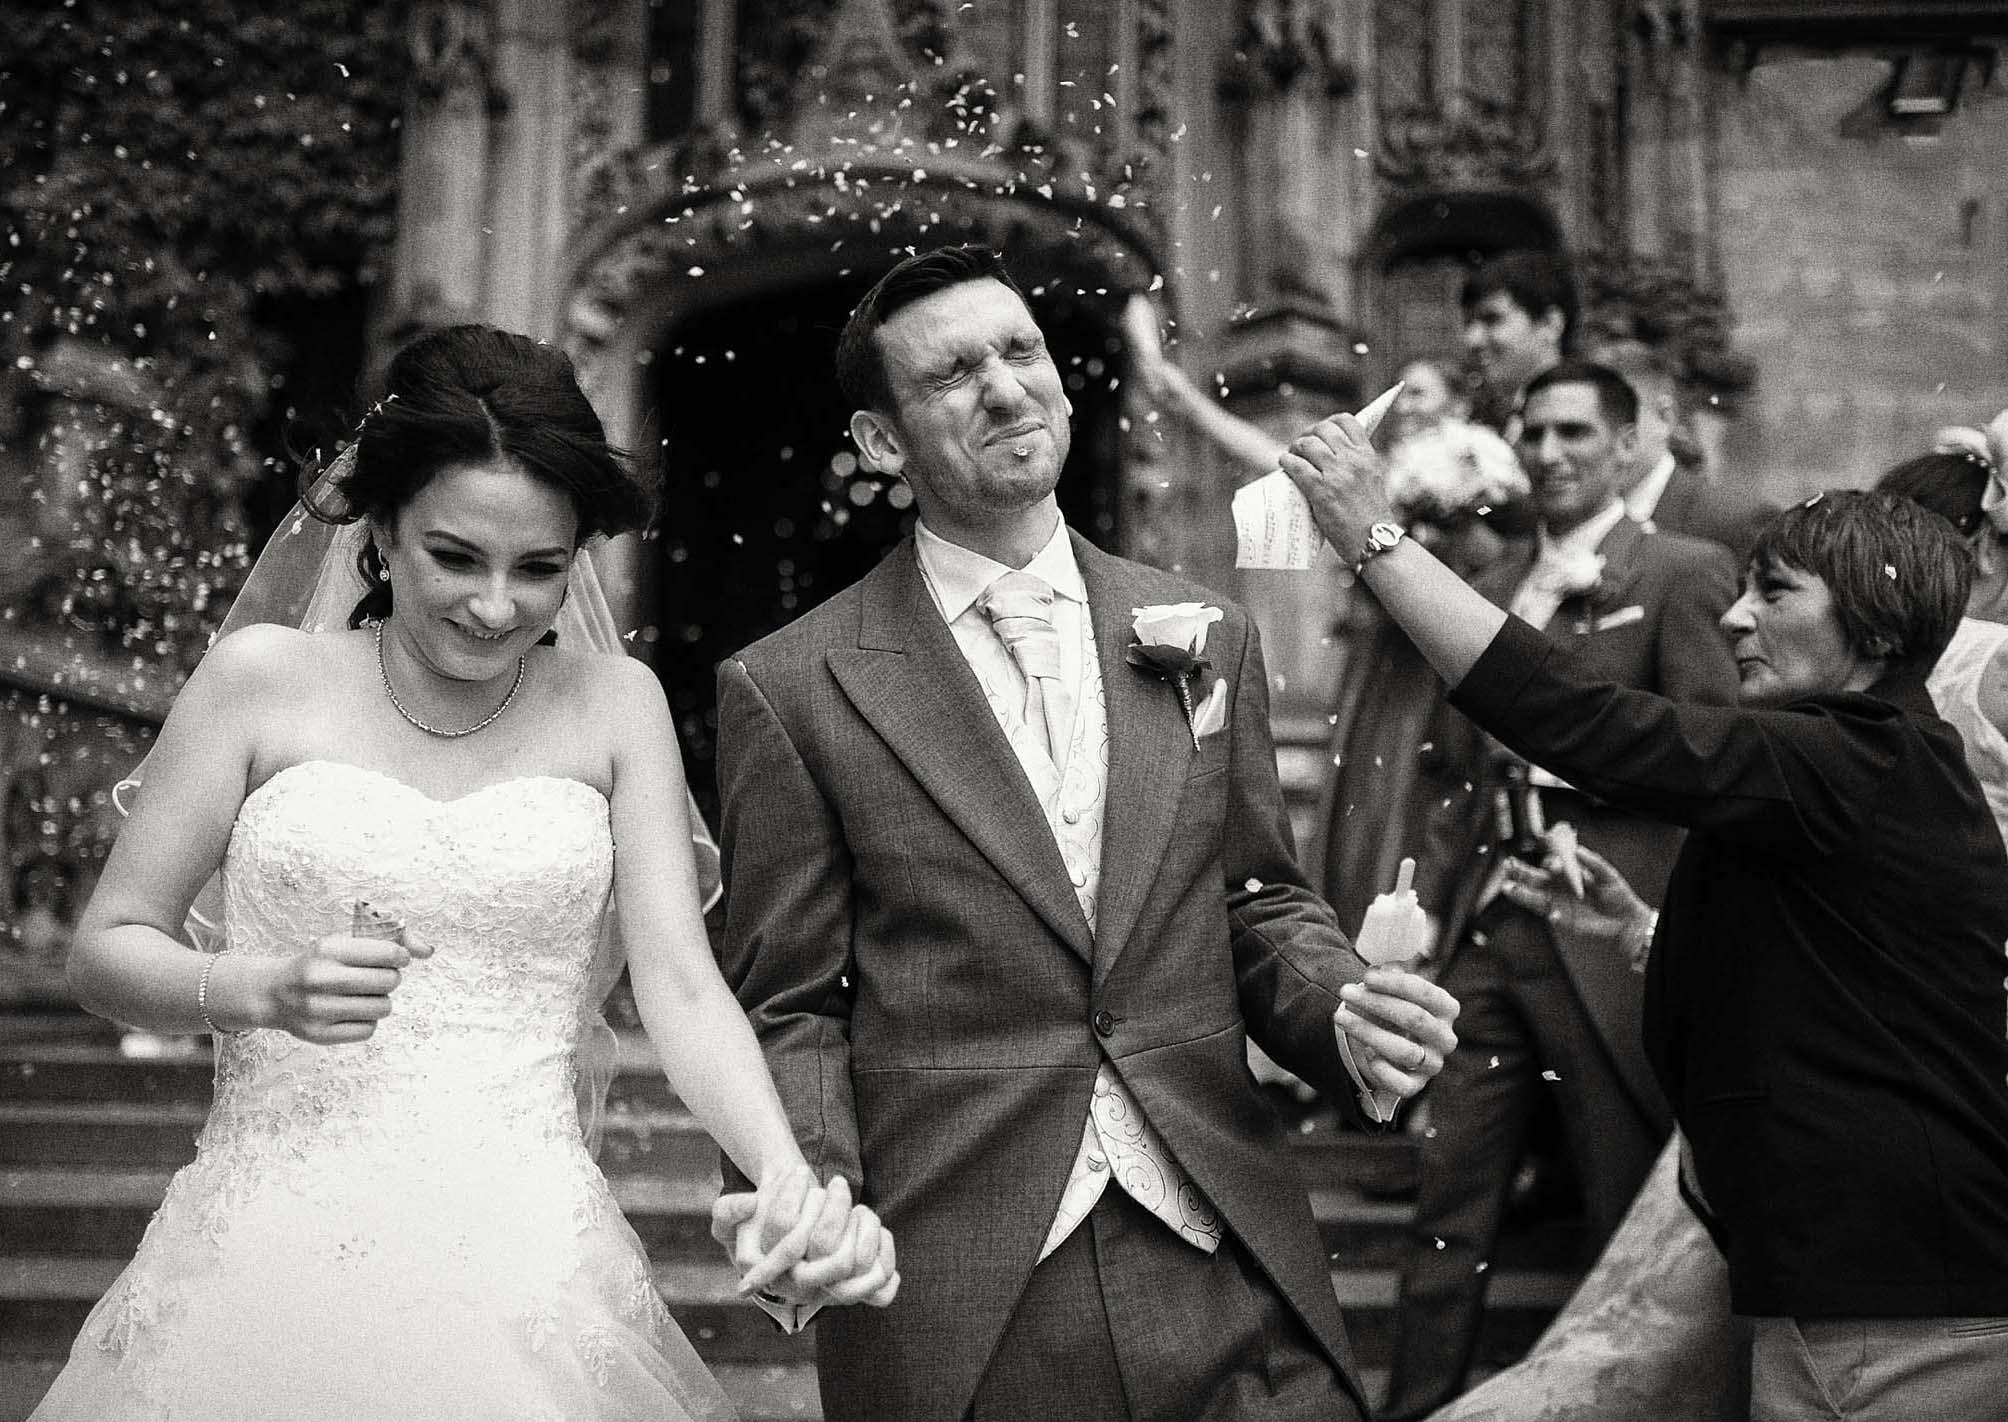 carlton towers wedding photo001.jpg